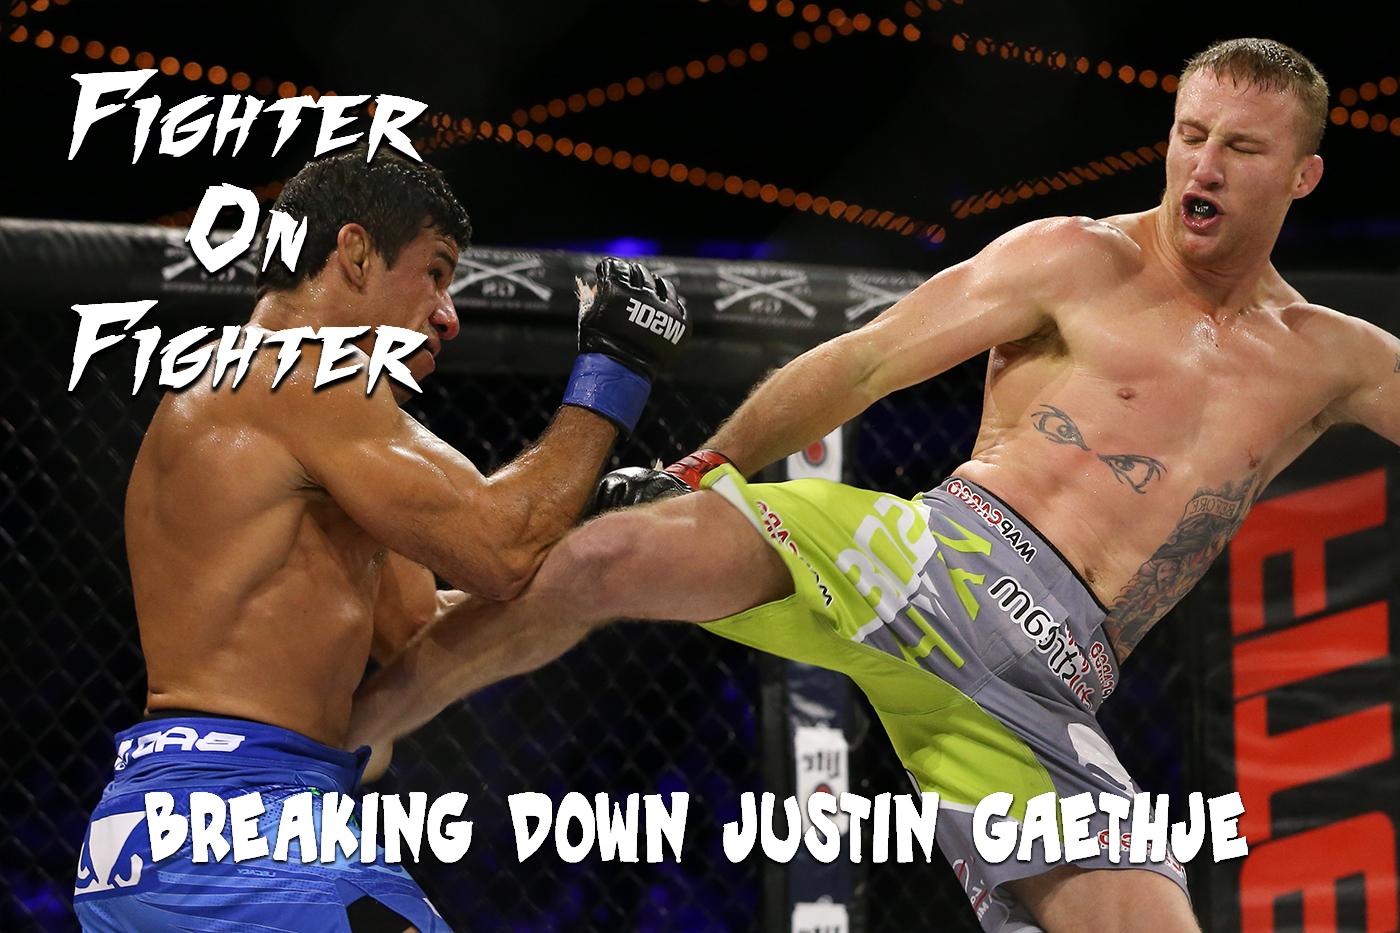 Justin Gaethje